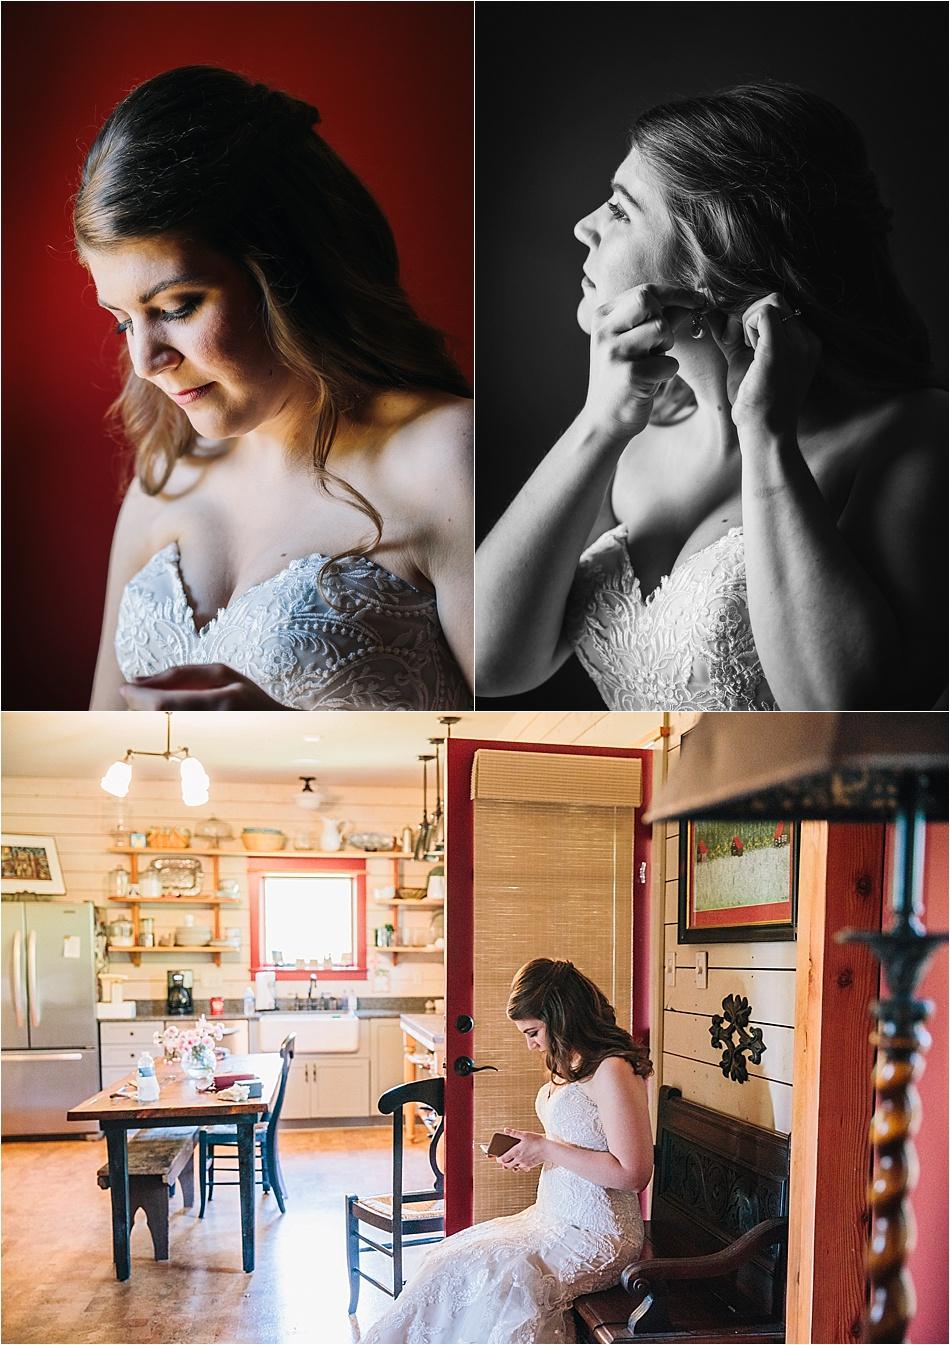 CK-Photo-Nashville-Wedding-Photographer-_0007.jpg